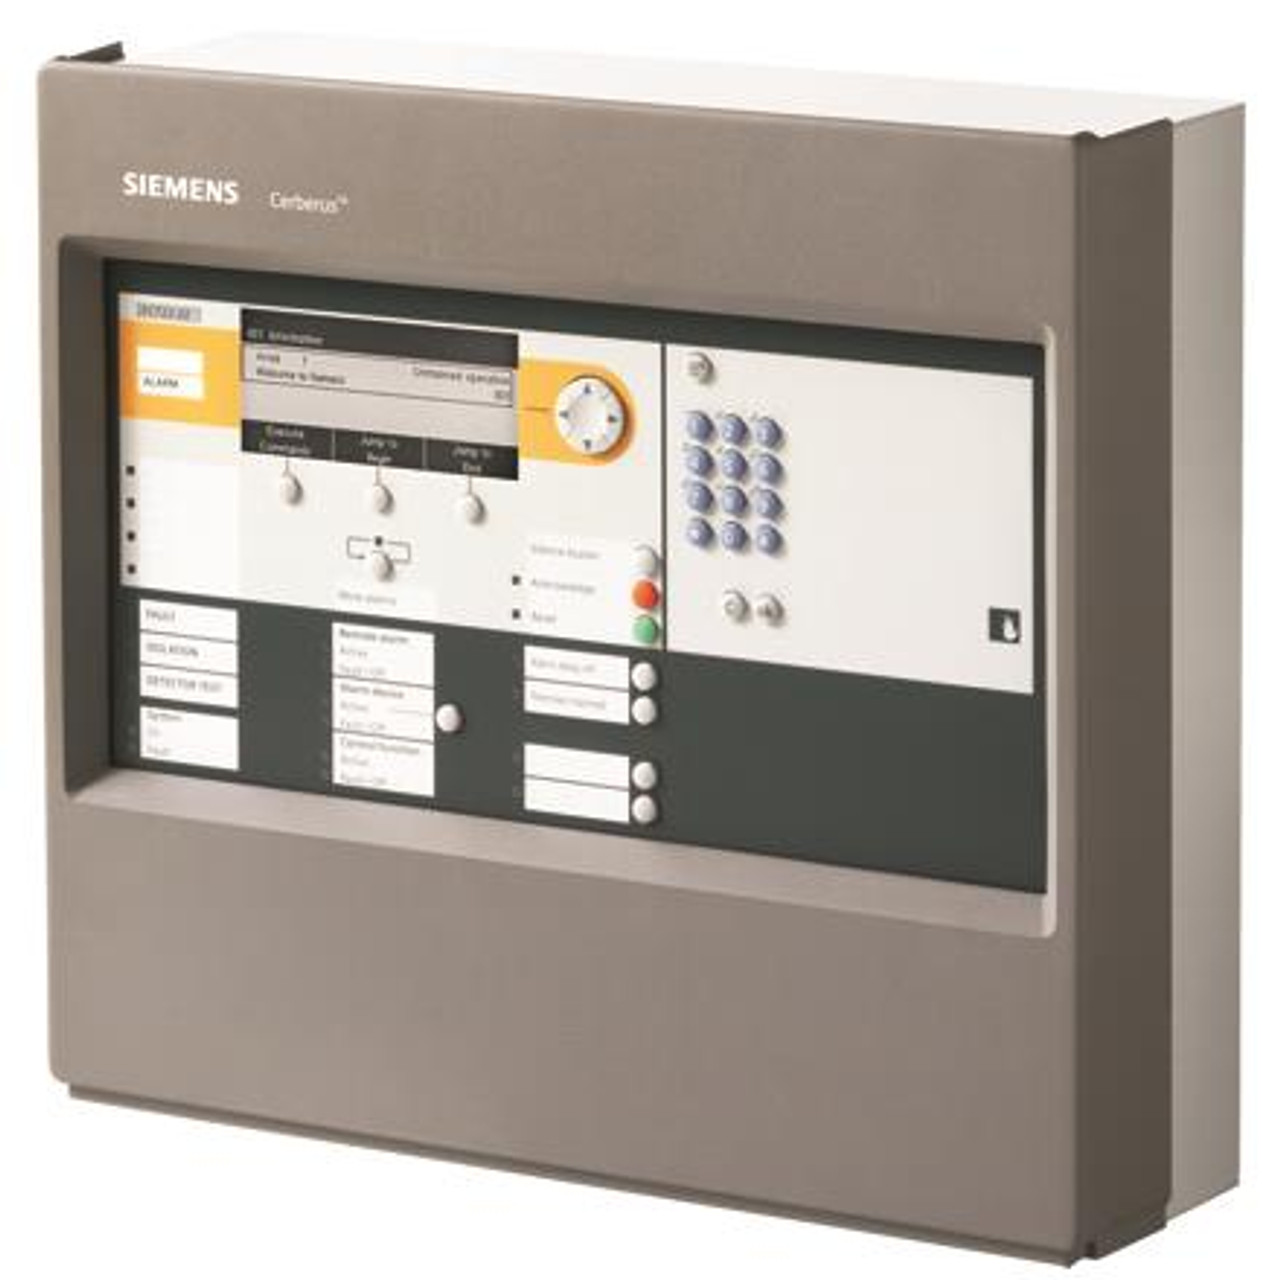 Siemens FC722-ZZ, S54400-C29-A5 Fire control panel